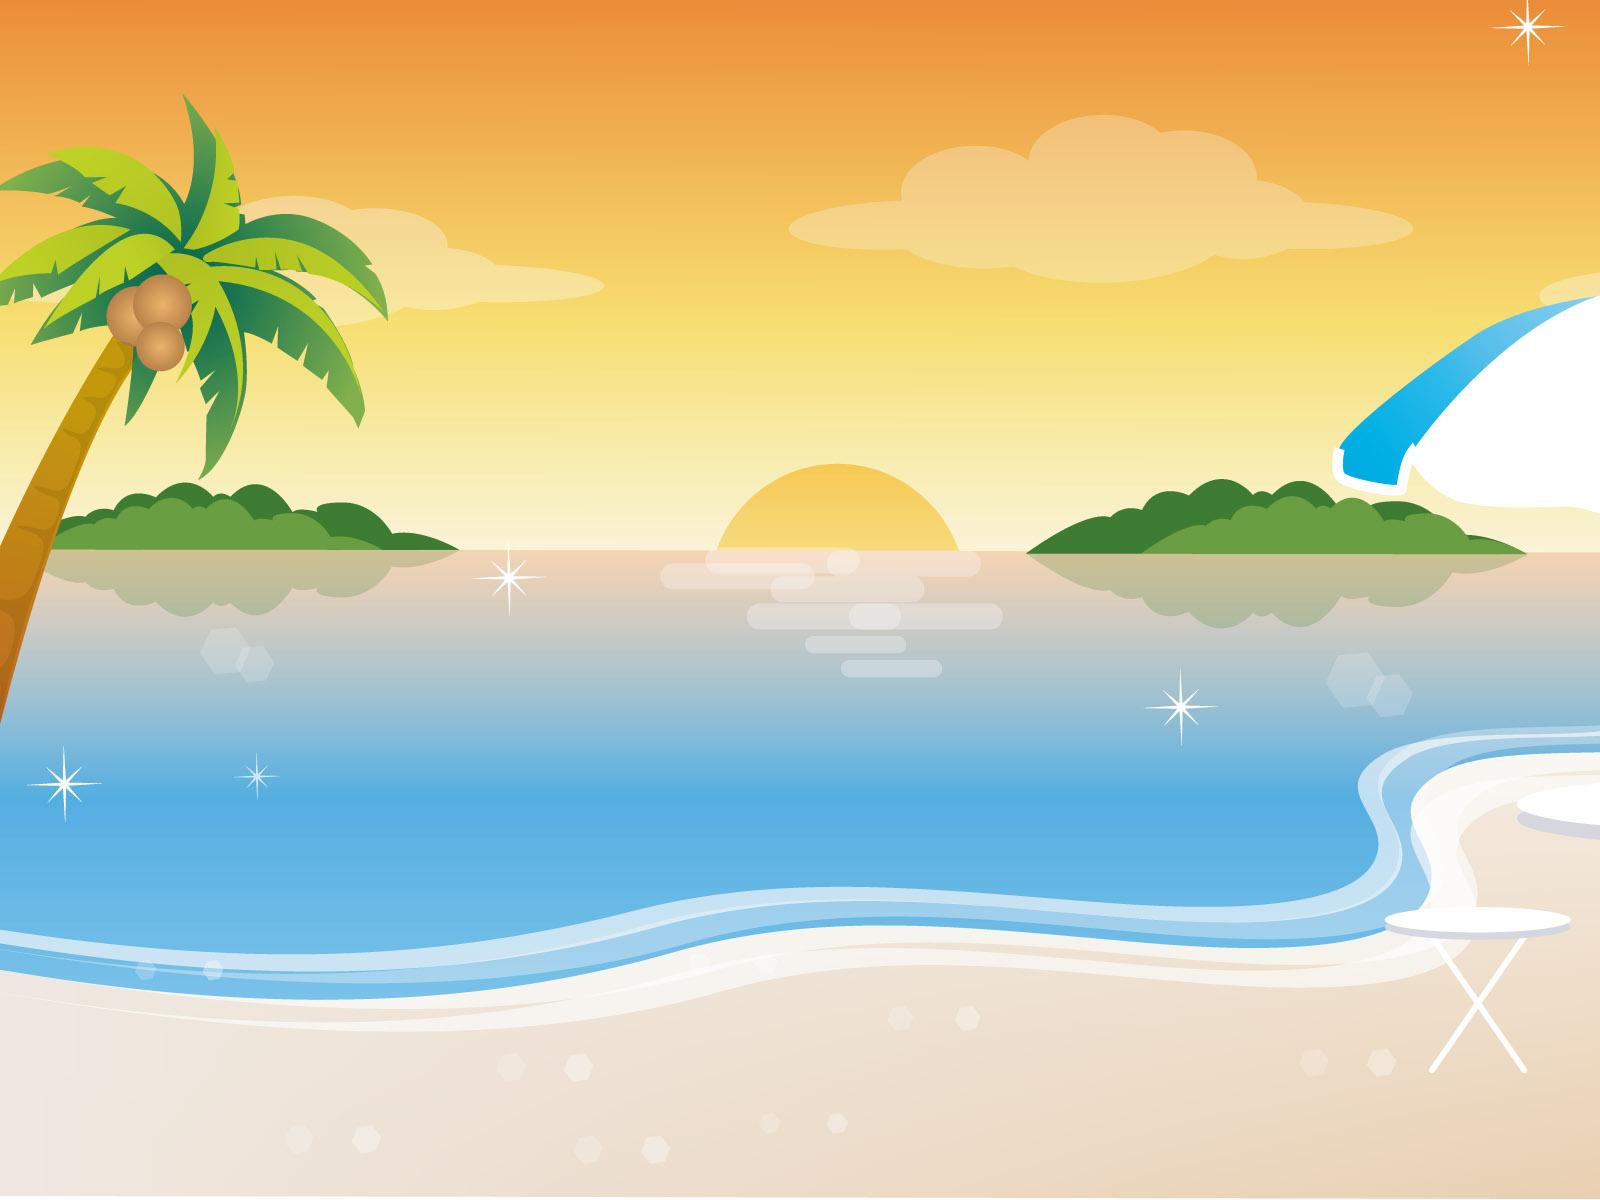 Beach Cartoon Background Desktop Image-Beach Cartoon Background Desktop Image-4